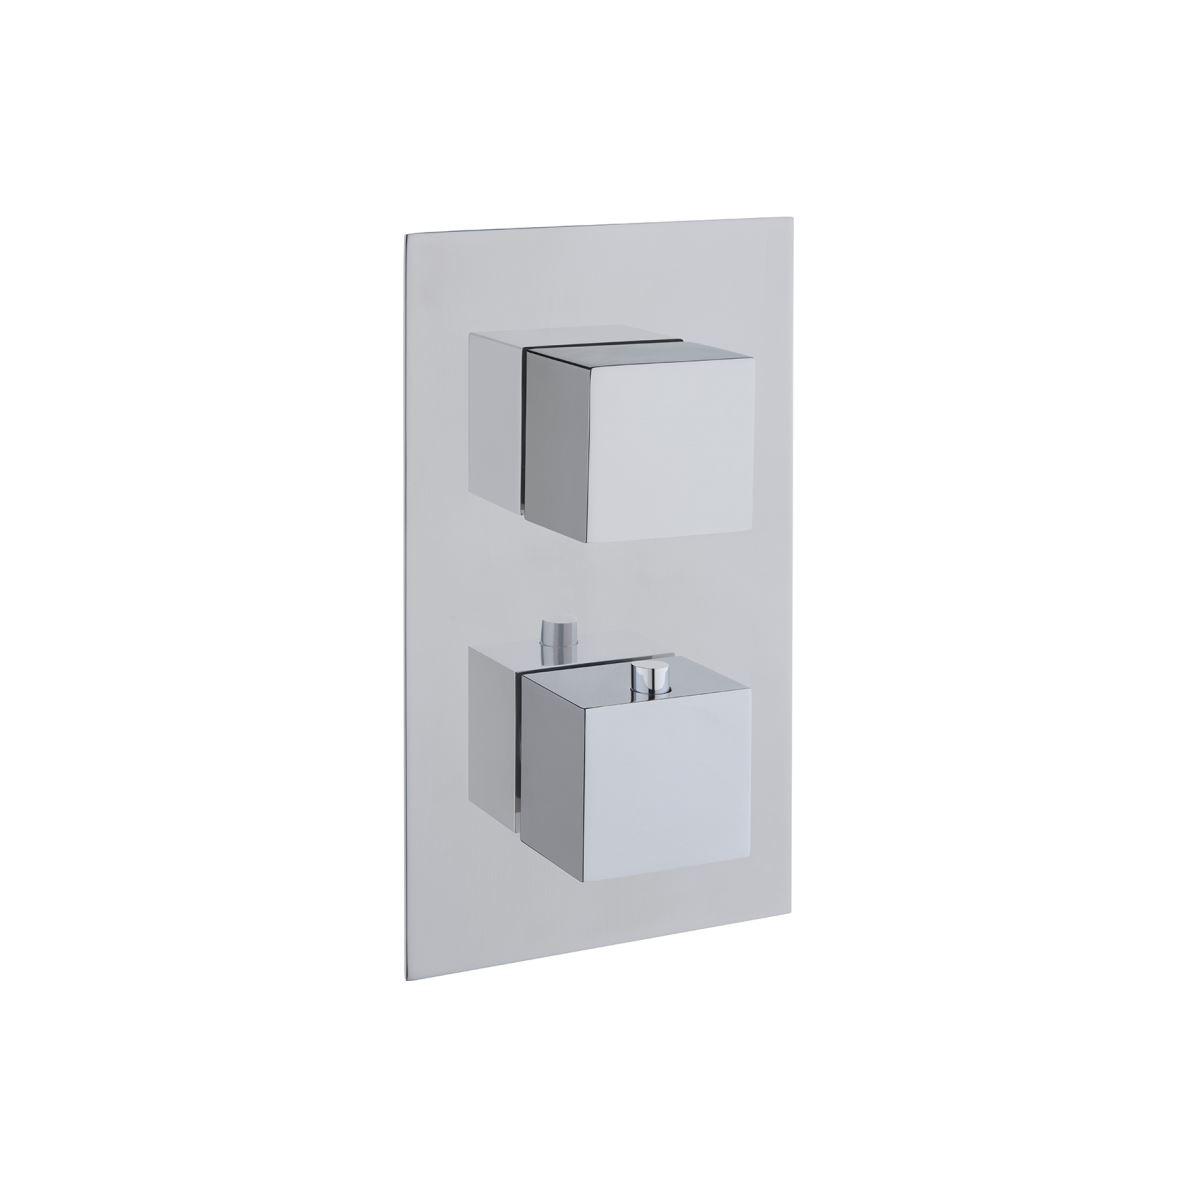 AquaHeat S2 Built-in Bath/Shower Mixer, 2-Way Diverter, Chrome